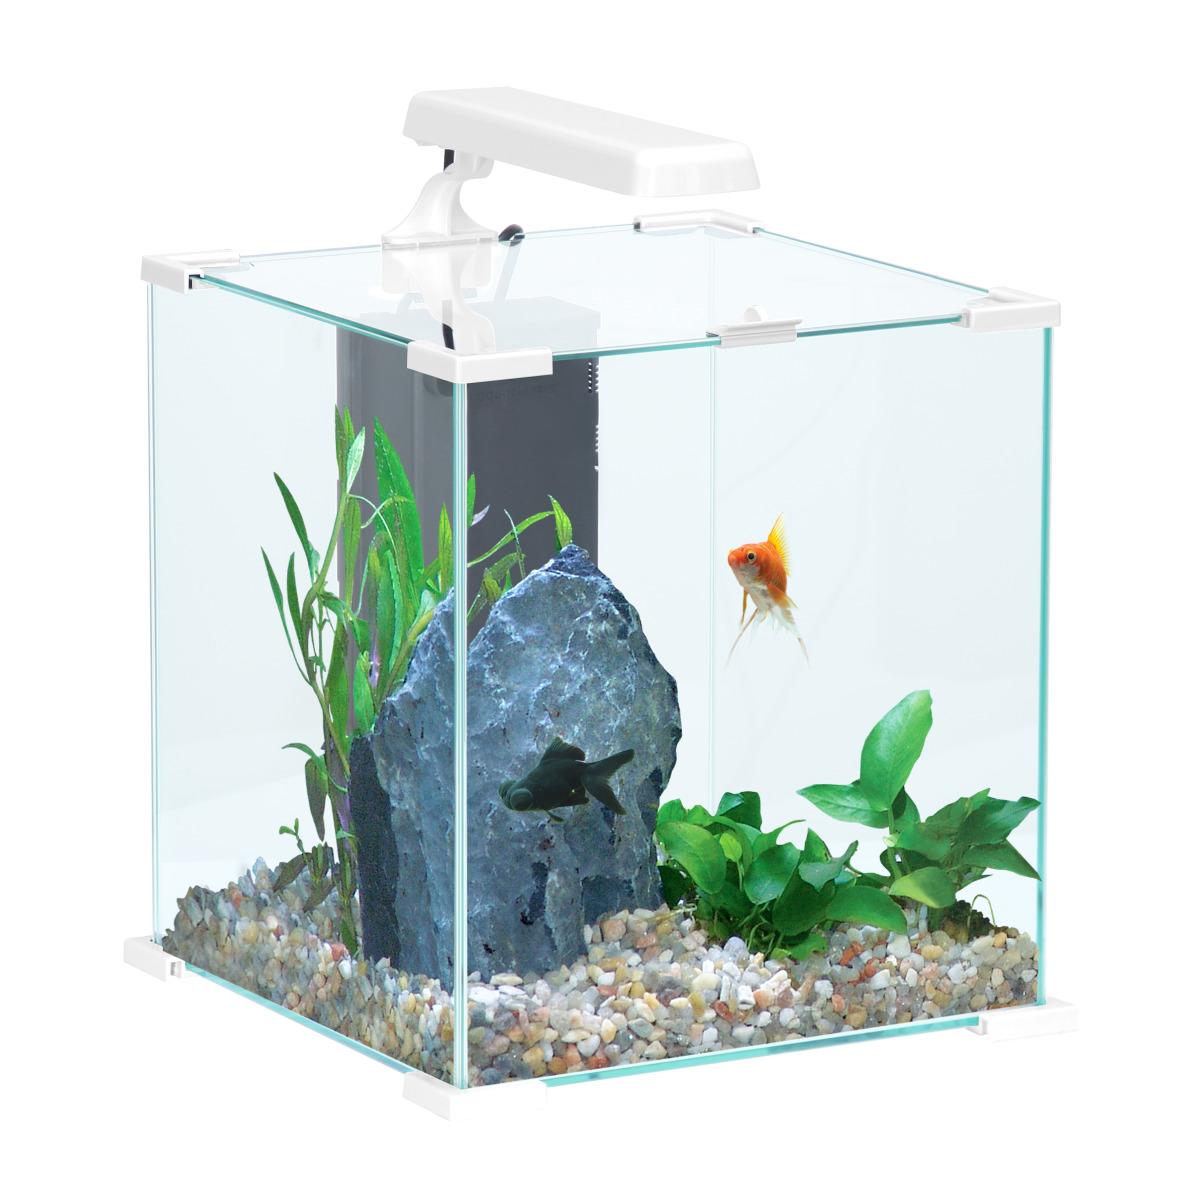 Zolux aqua nanolife cube 20 blanc nano aquarium 22 l tout for Aquarium zolux